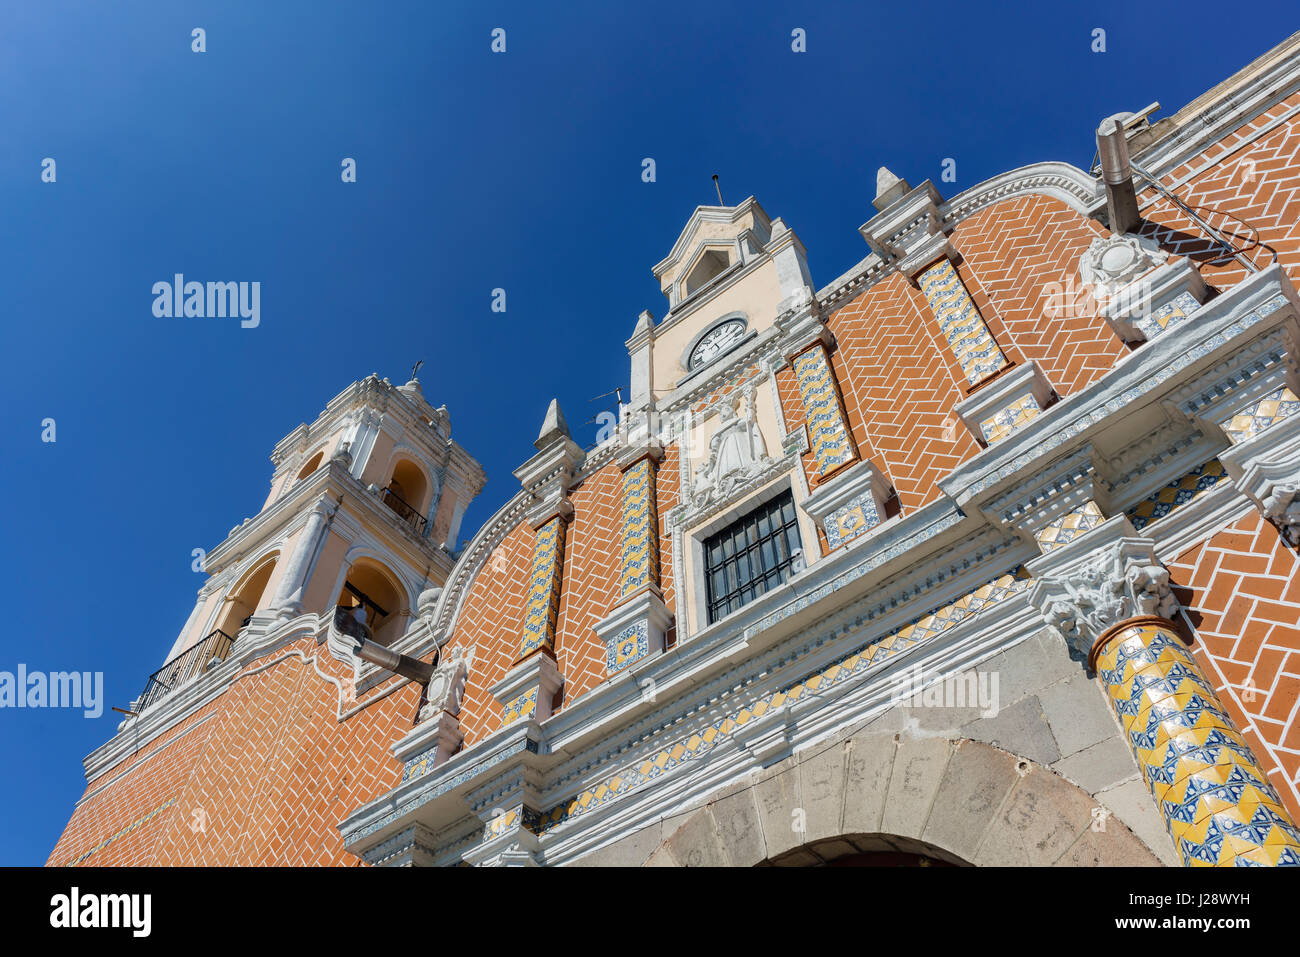 Exterior  view of beautiful church at Puebla, Mexico - Stock Image